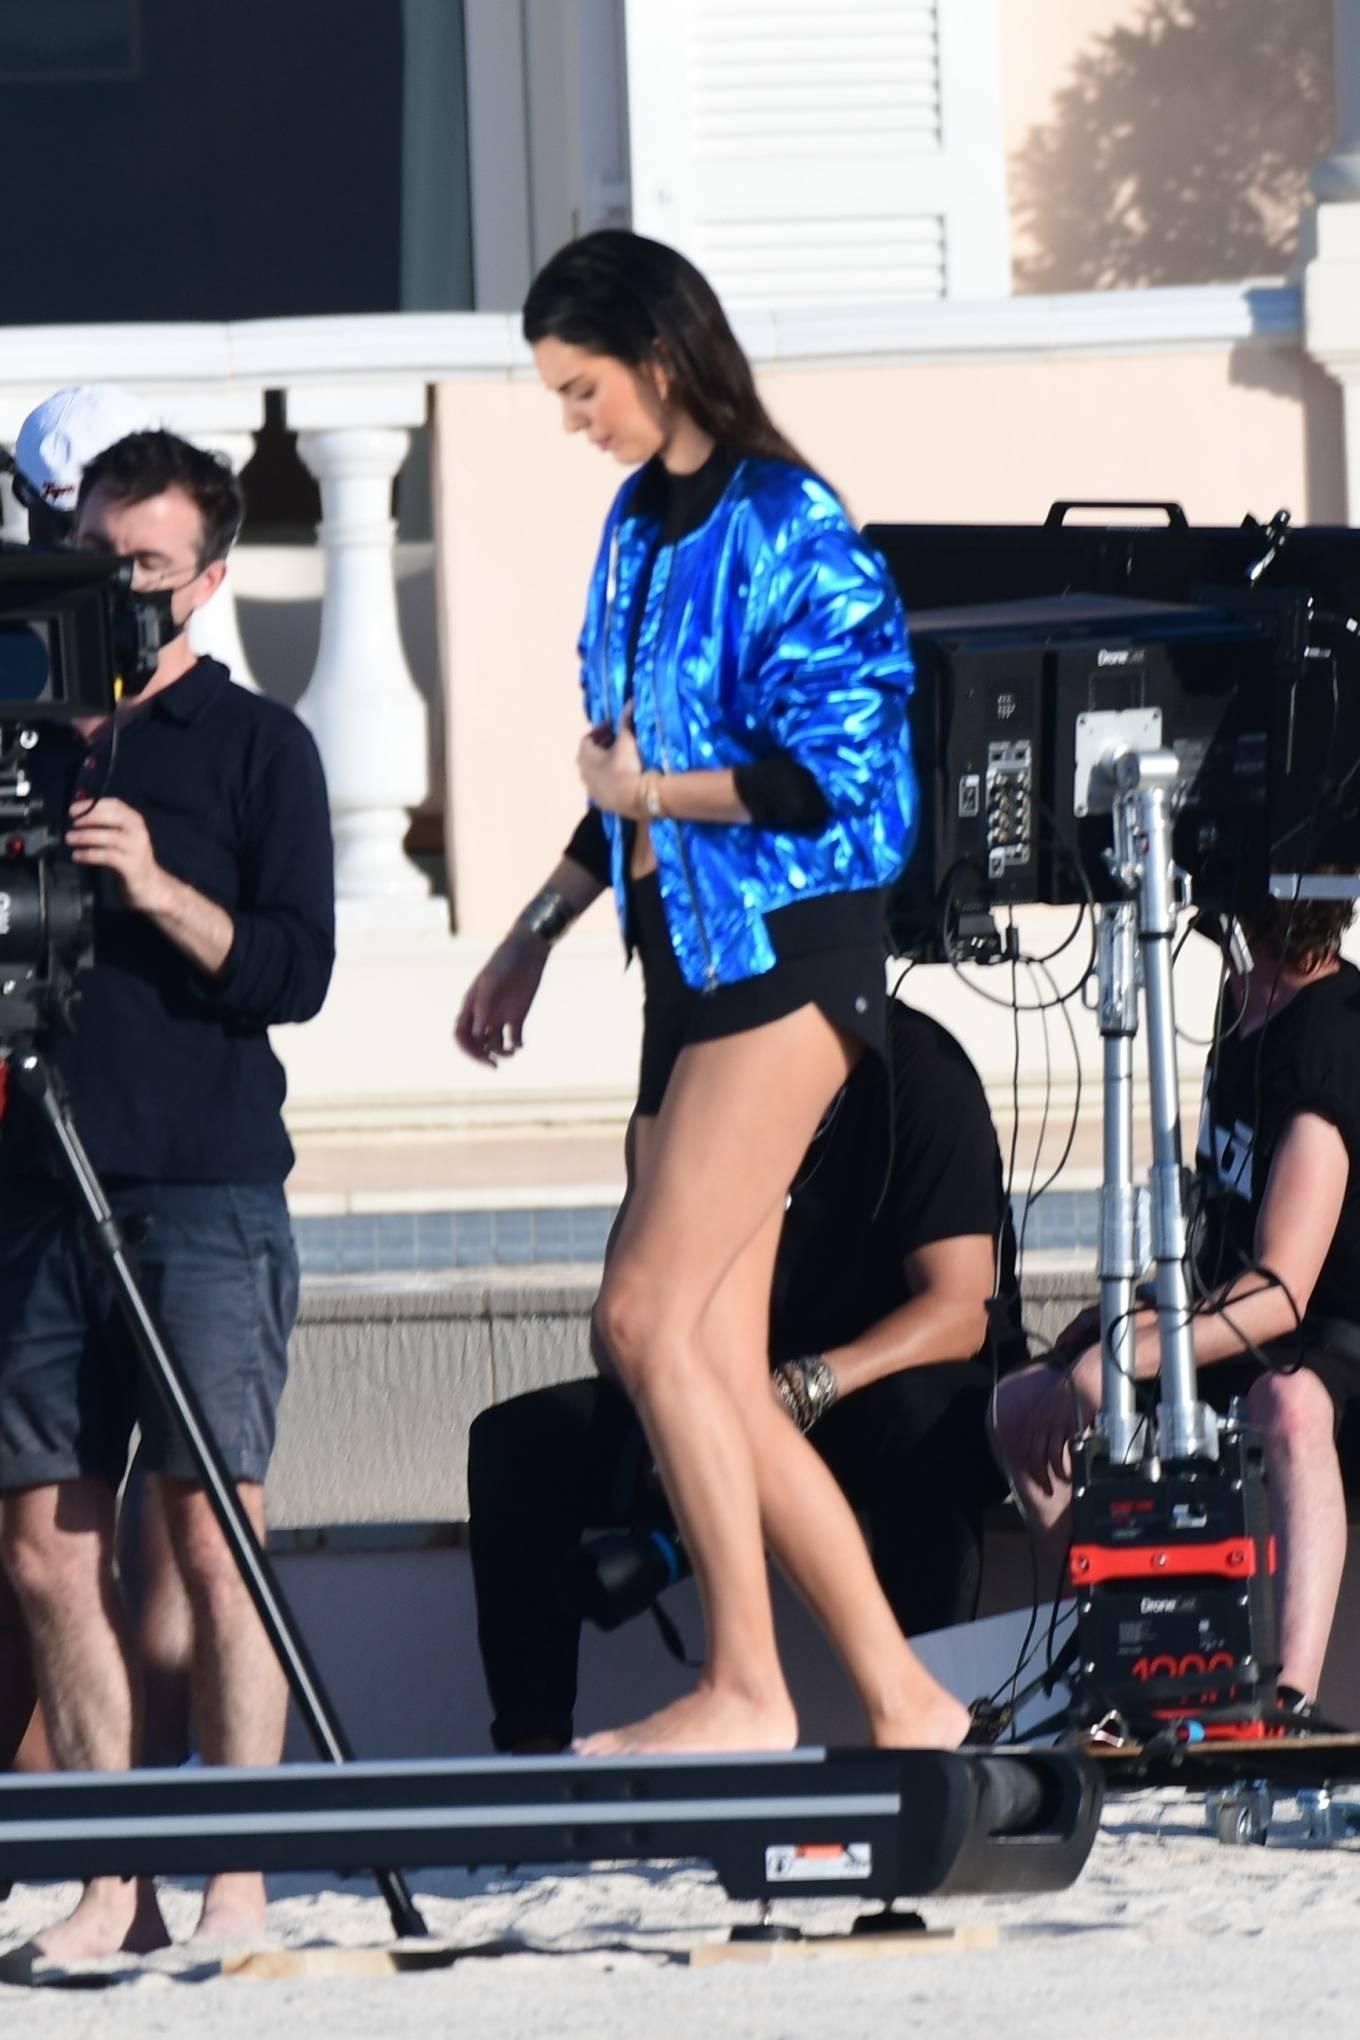 Kendall Jenner, blue jacket, black crop top, waist length, rolled sleeves, baseball collar, open front, front zip, black bikini bottom. Kendall Jenner wearing a metallic blue open front jacket with rolled sleeves and baseball collar